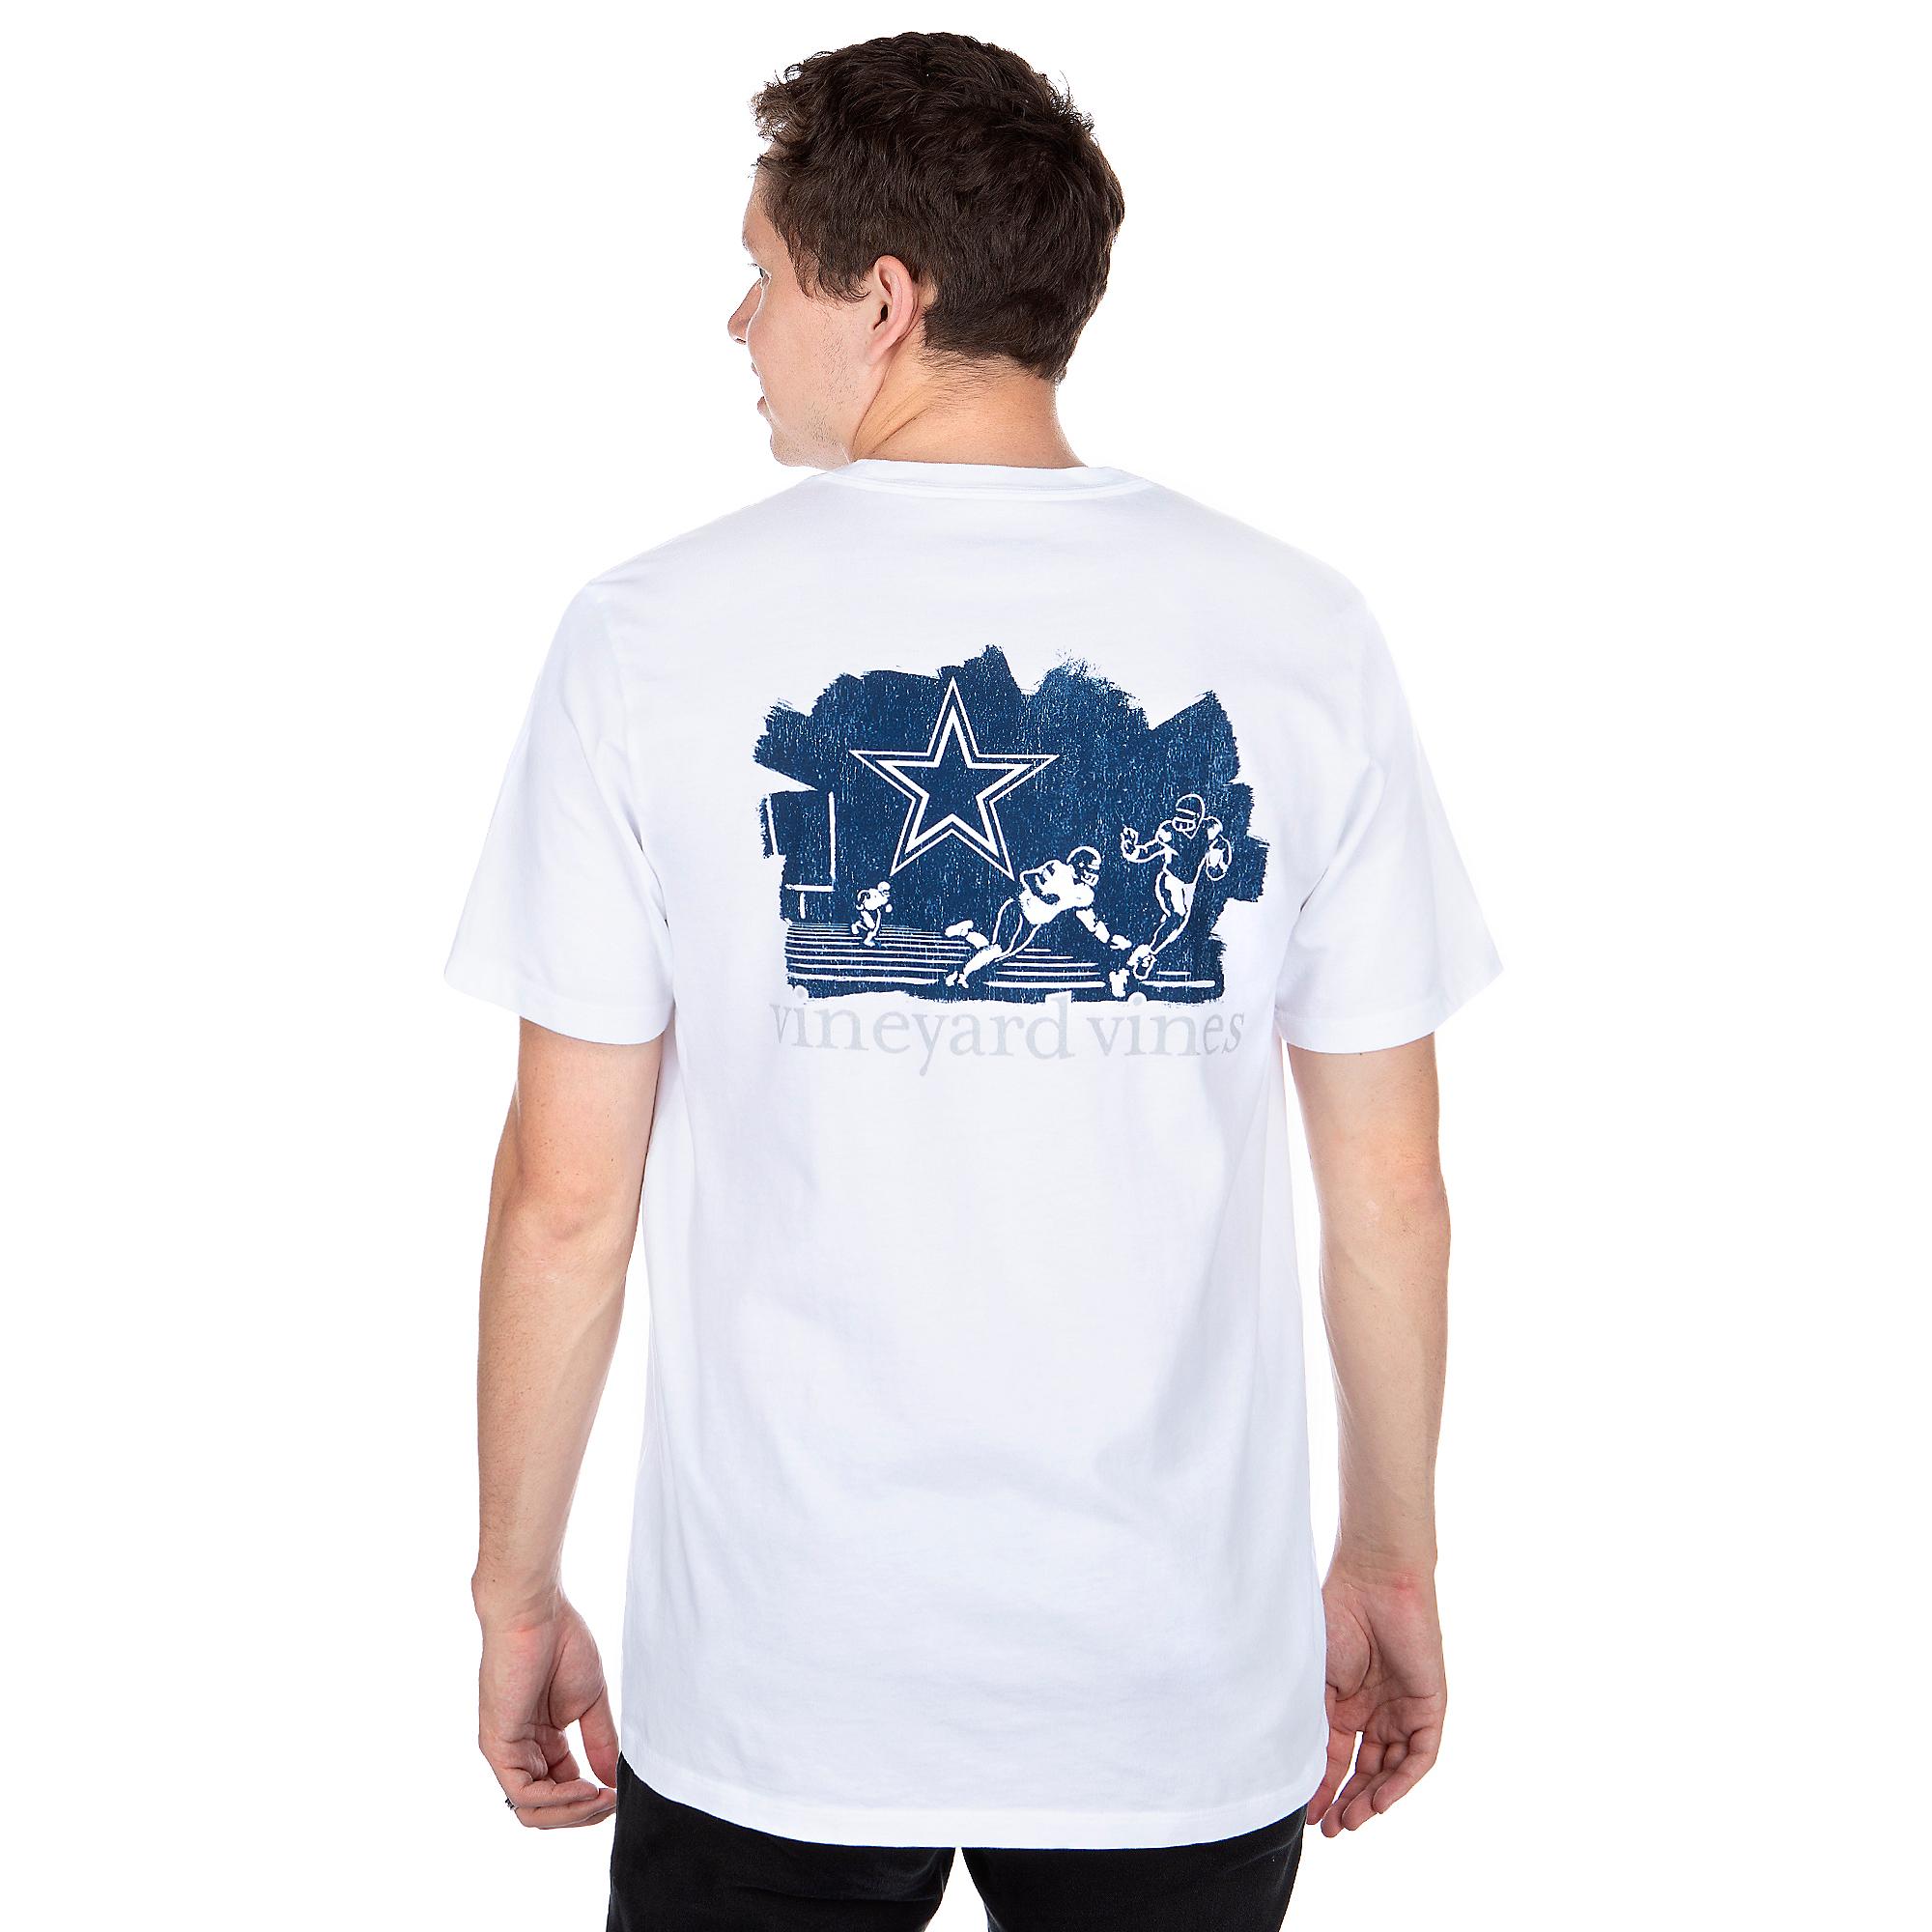 Dallas Cowboys Vineyard Vines Stiff Arm Short Sleeve T-Shirt